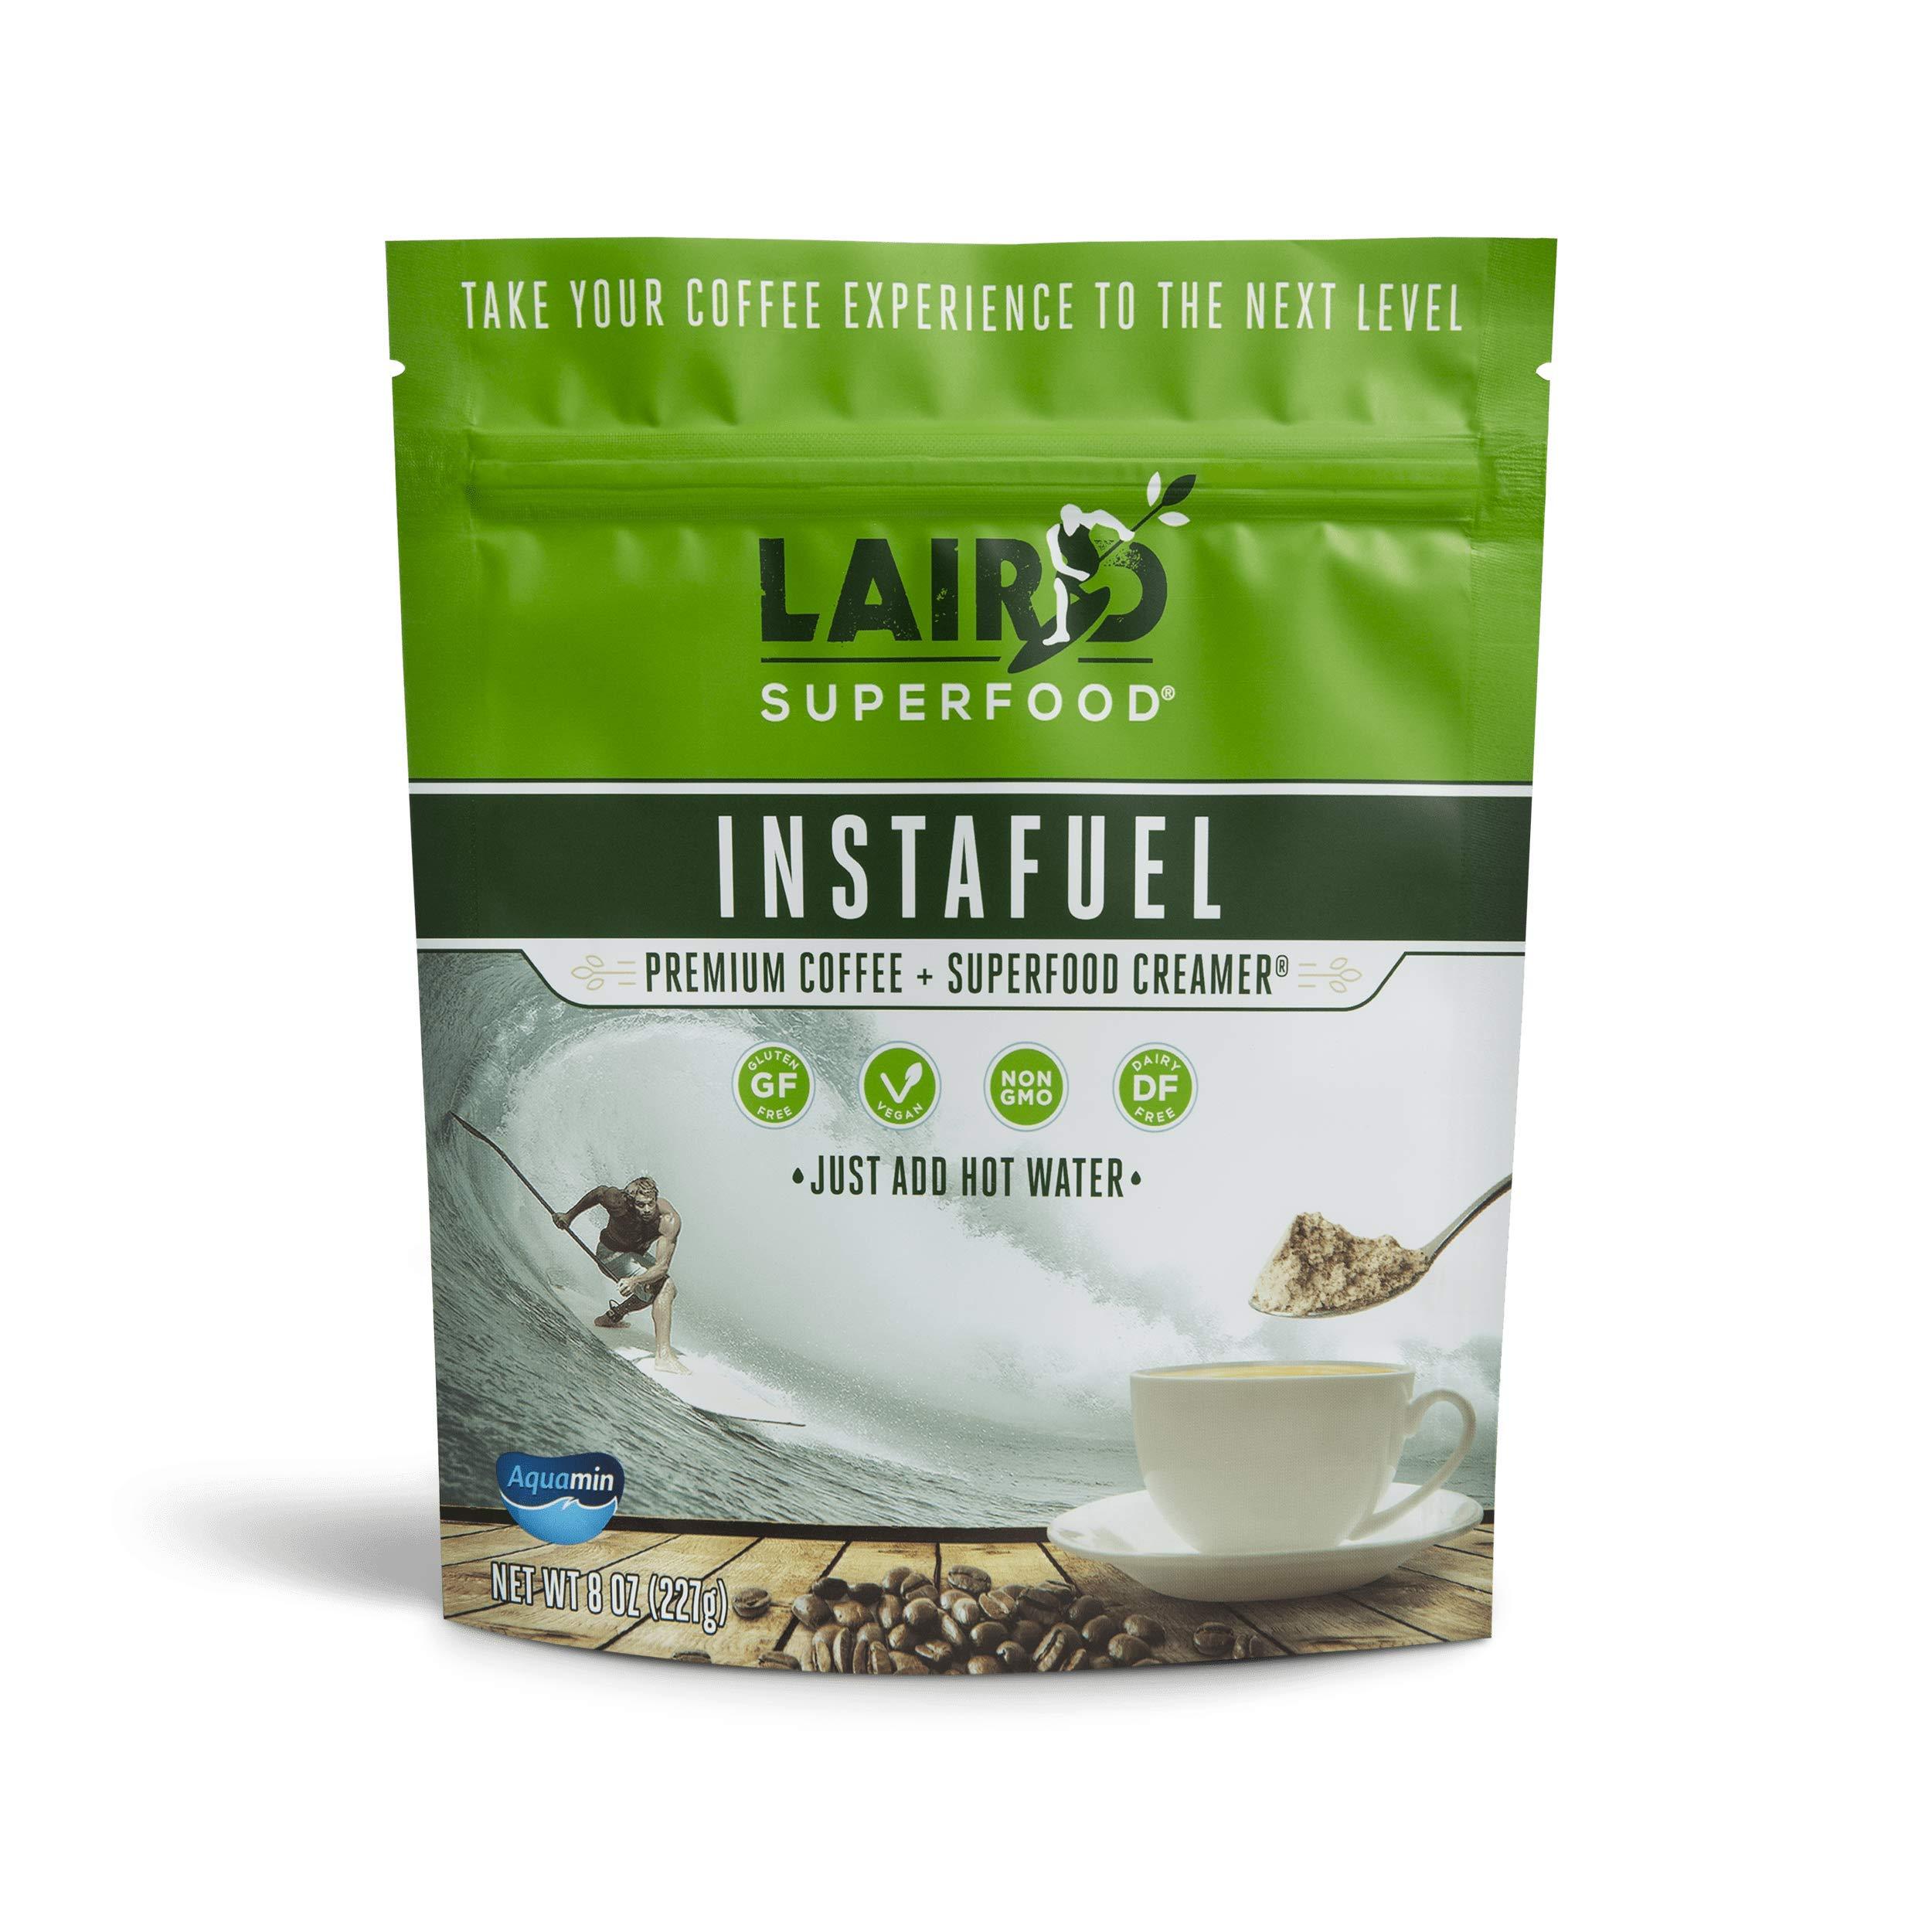 Laird Superfood Instafuel Premium Instant Coffee | Premium Arabica Coffee with Superfood Original Creamer Added | Non-Dairy | Organic | Gluten Free | Vegan - 1 lb Bag